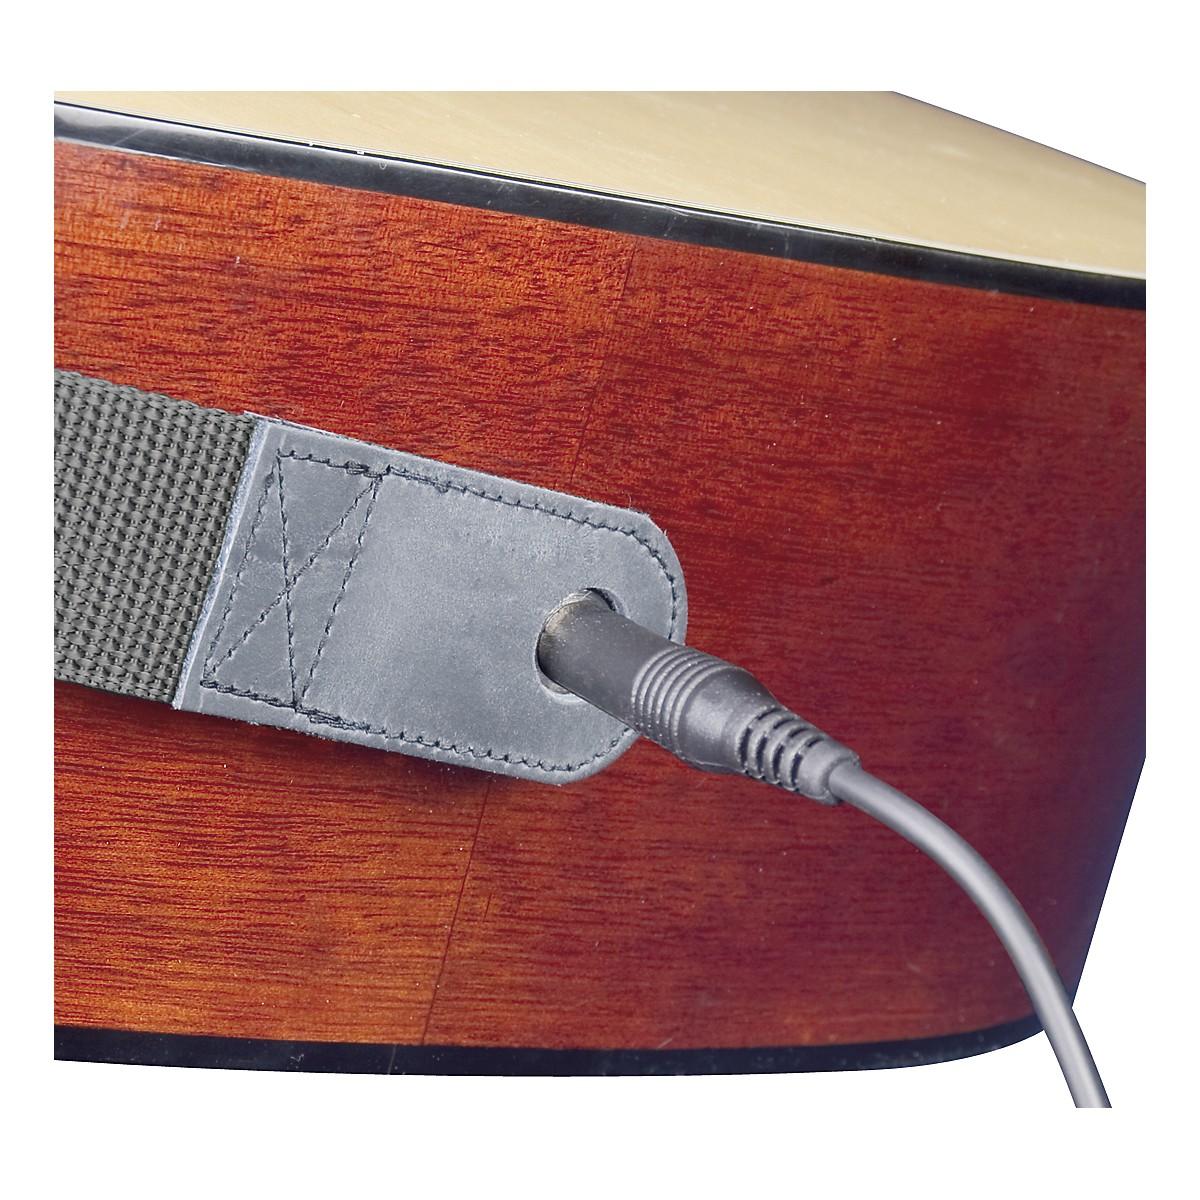 Neotech Slimline Acoustic Guitar Strap - End Pin Jack Version Long